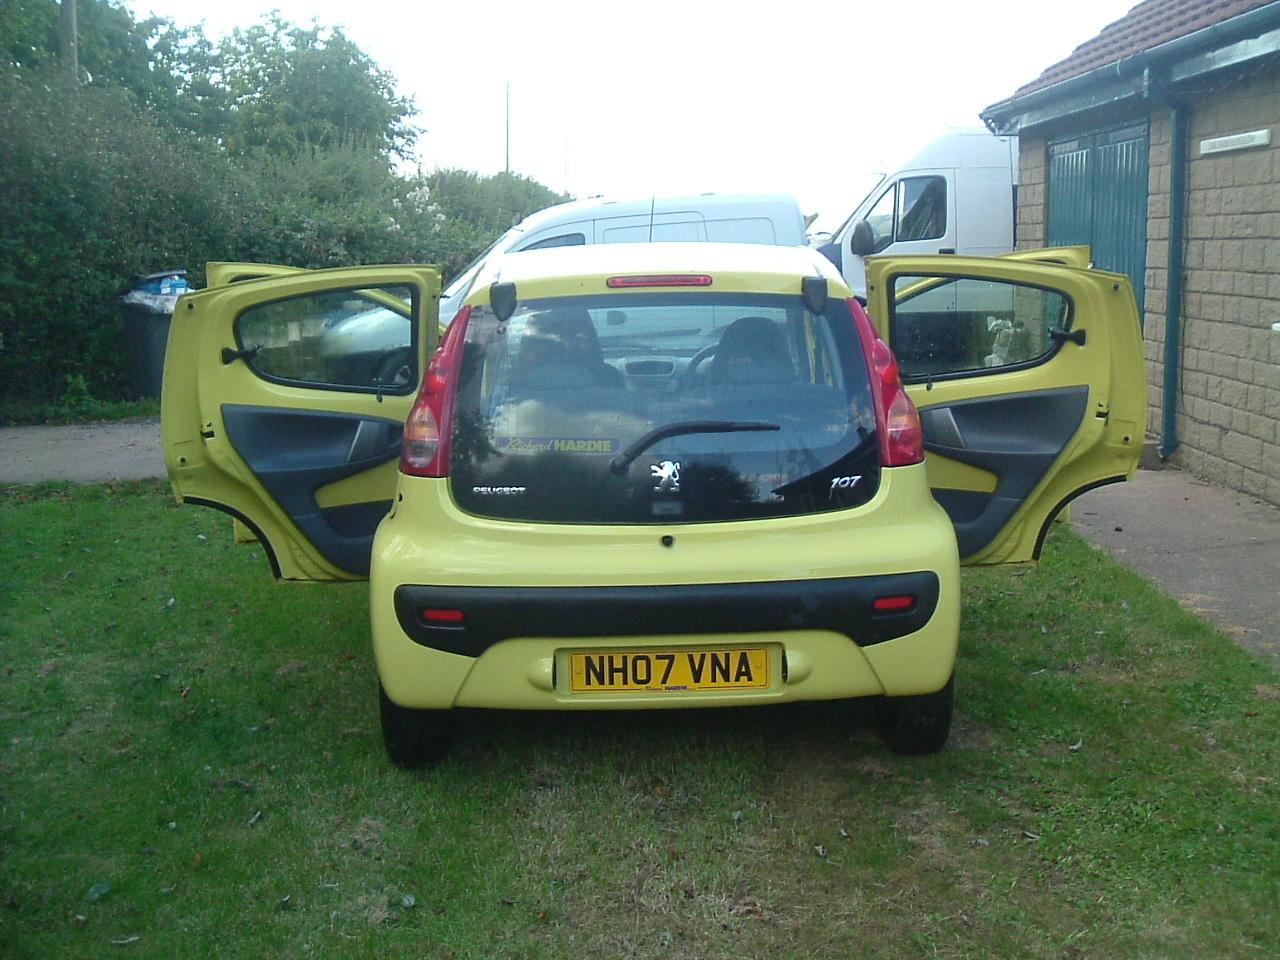 Los 39 - Peugeot 107 Urban 5 Door Petrol